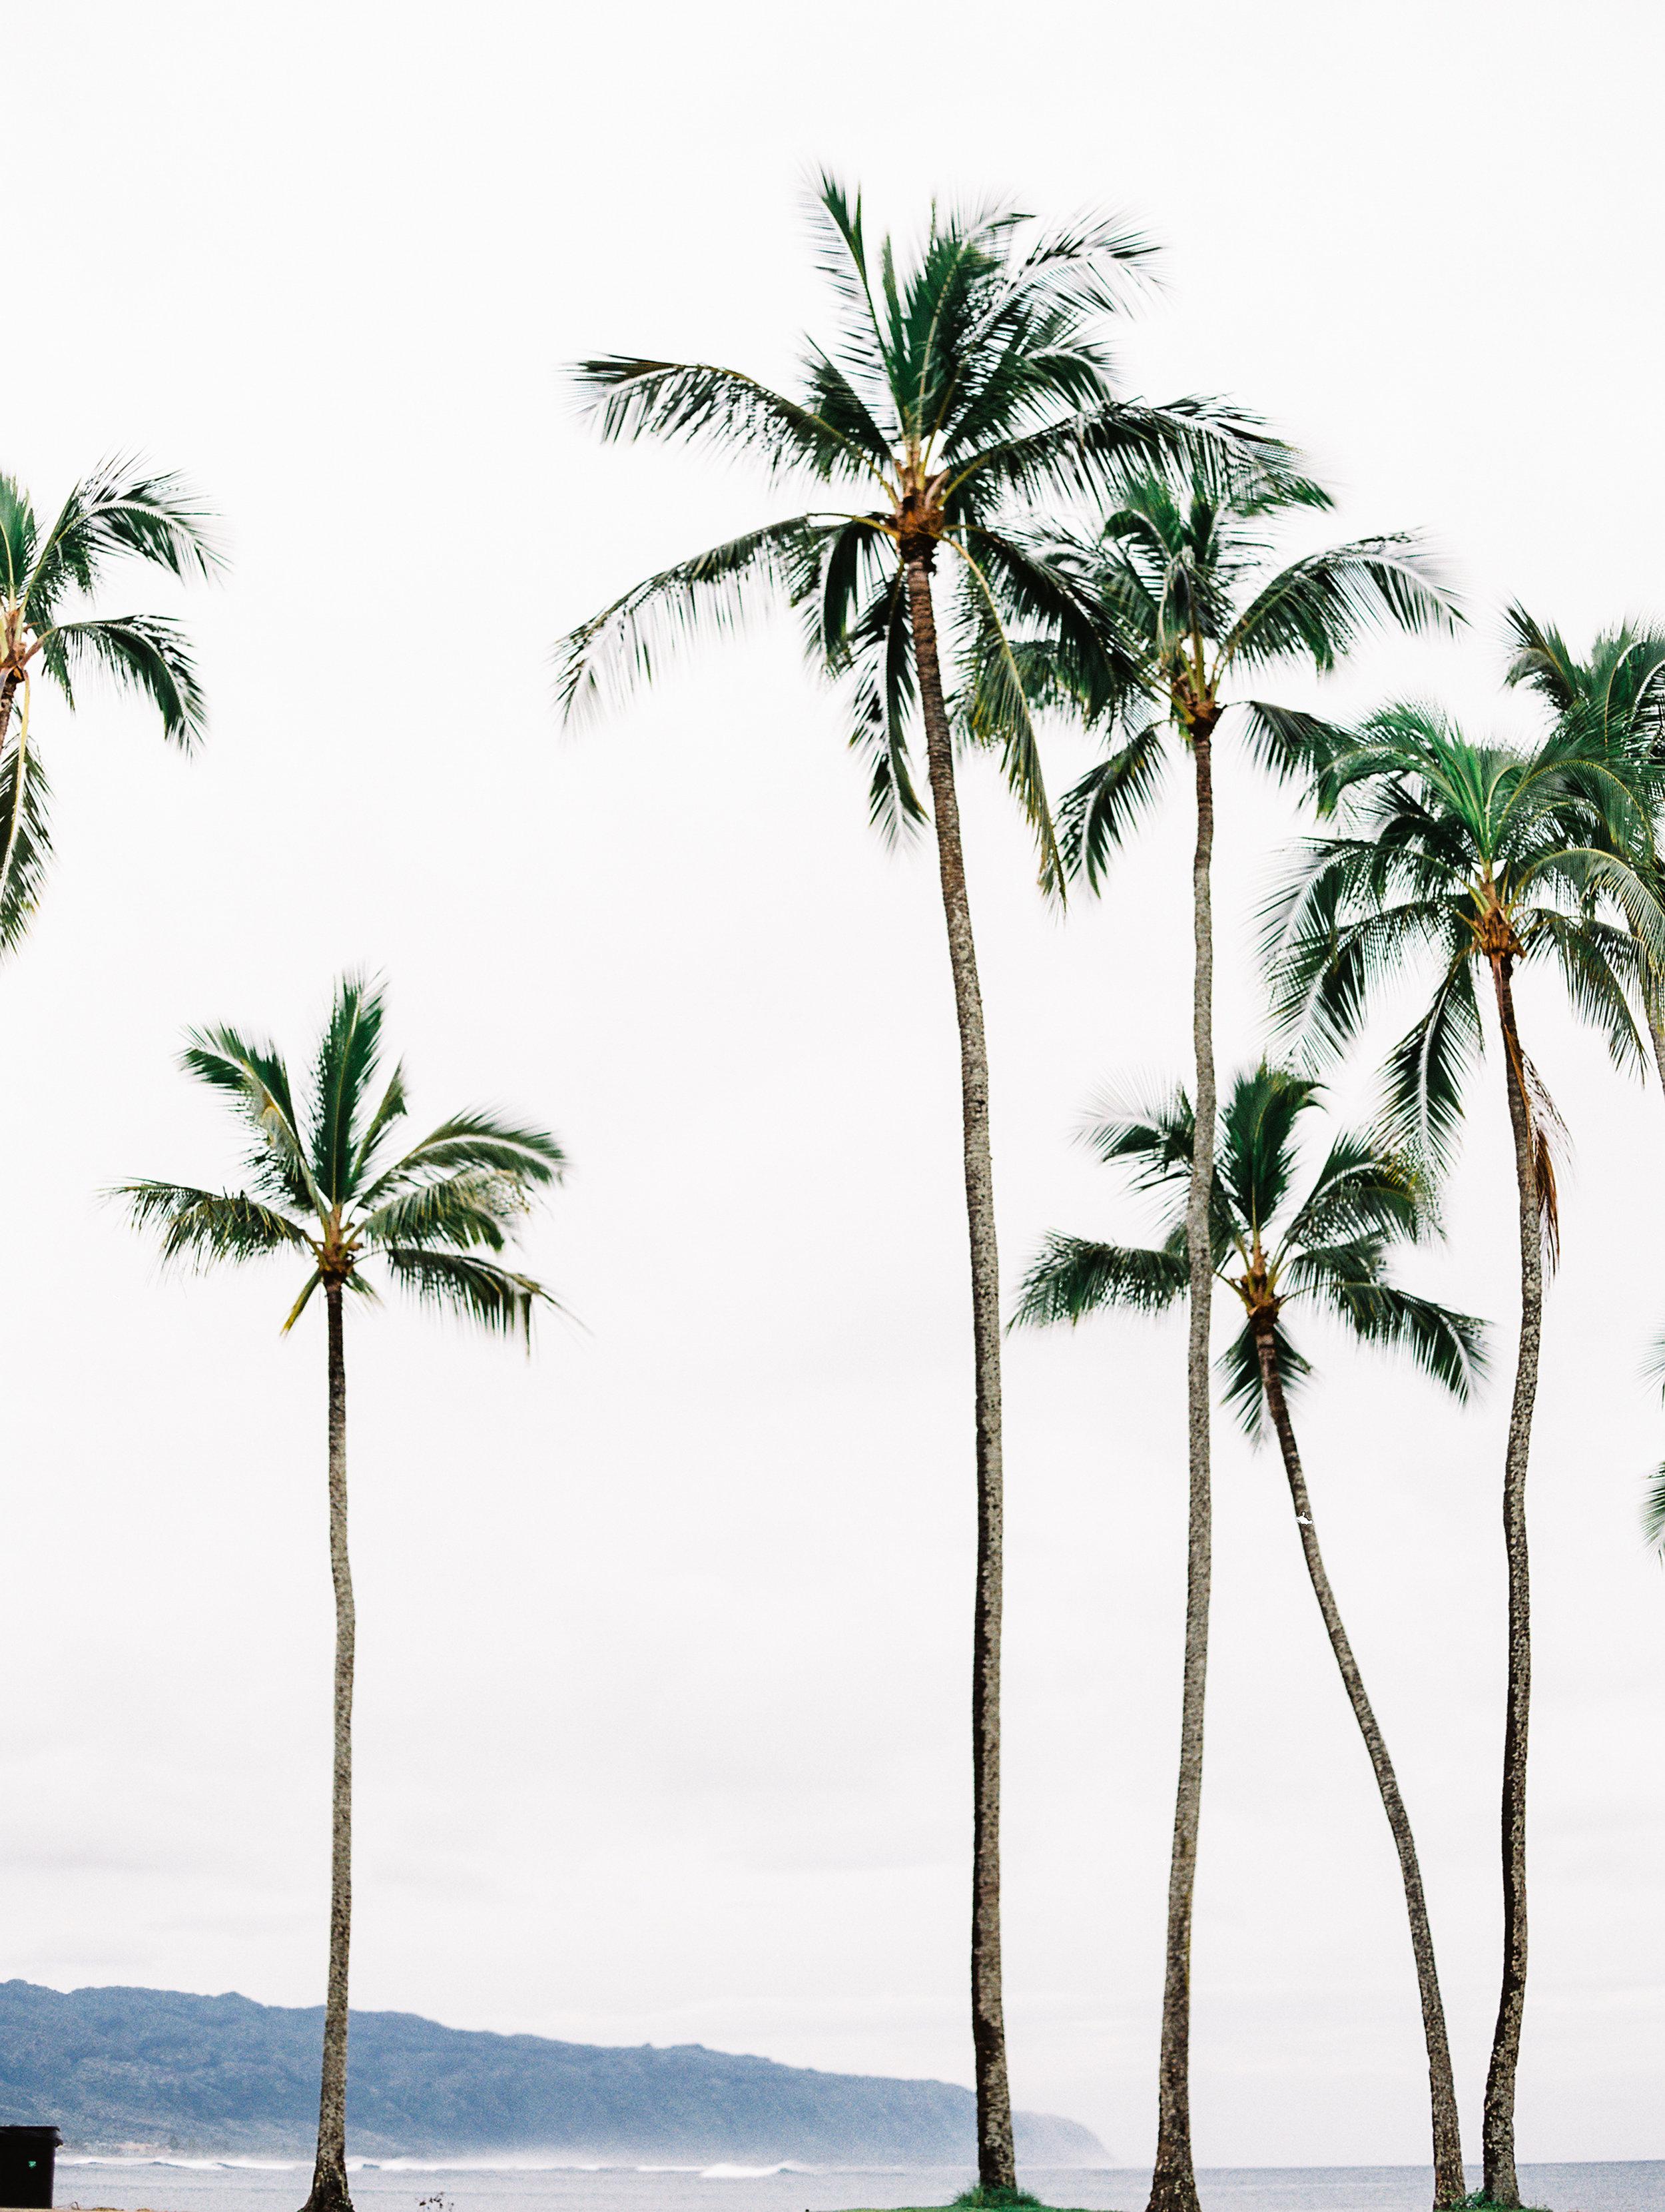 film-Hawaii-Kailee-DiMeglio-Photography-palm-trees-118.jpg